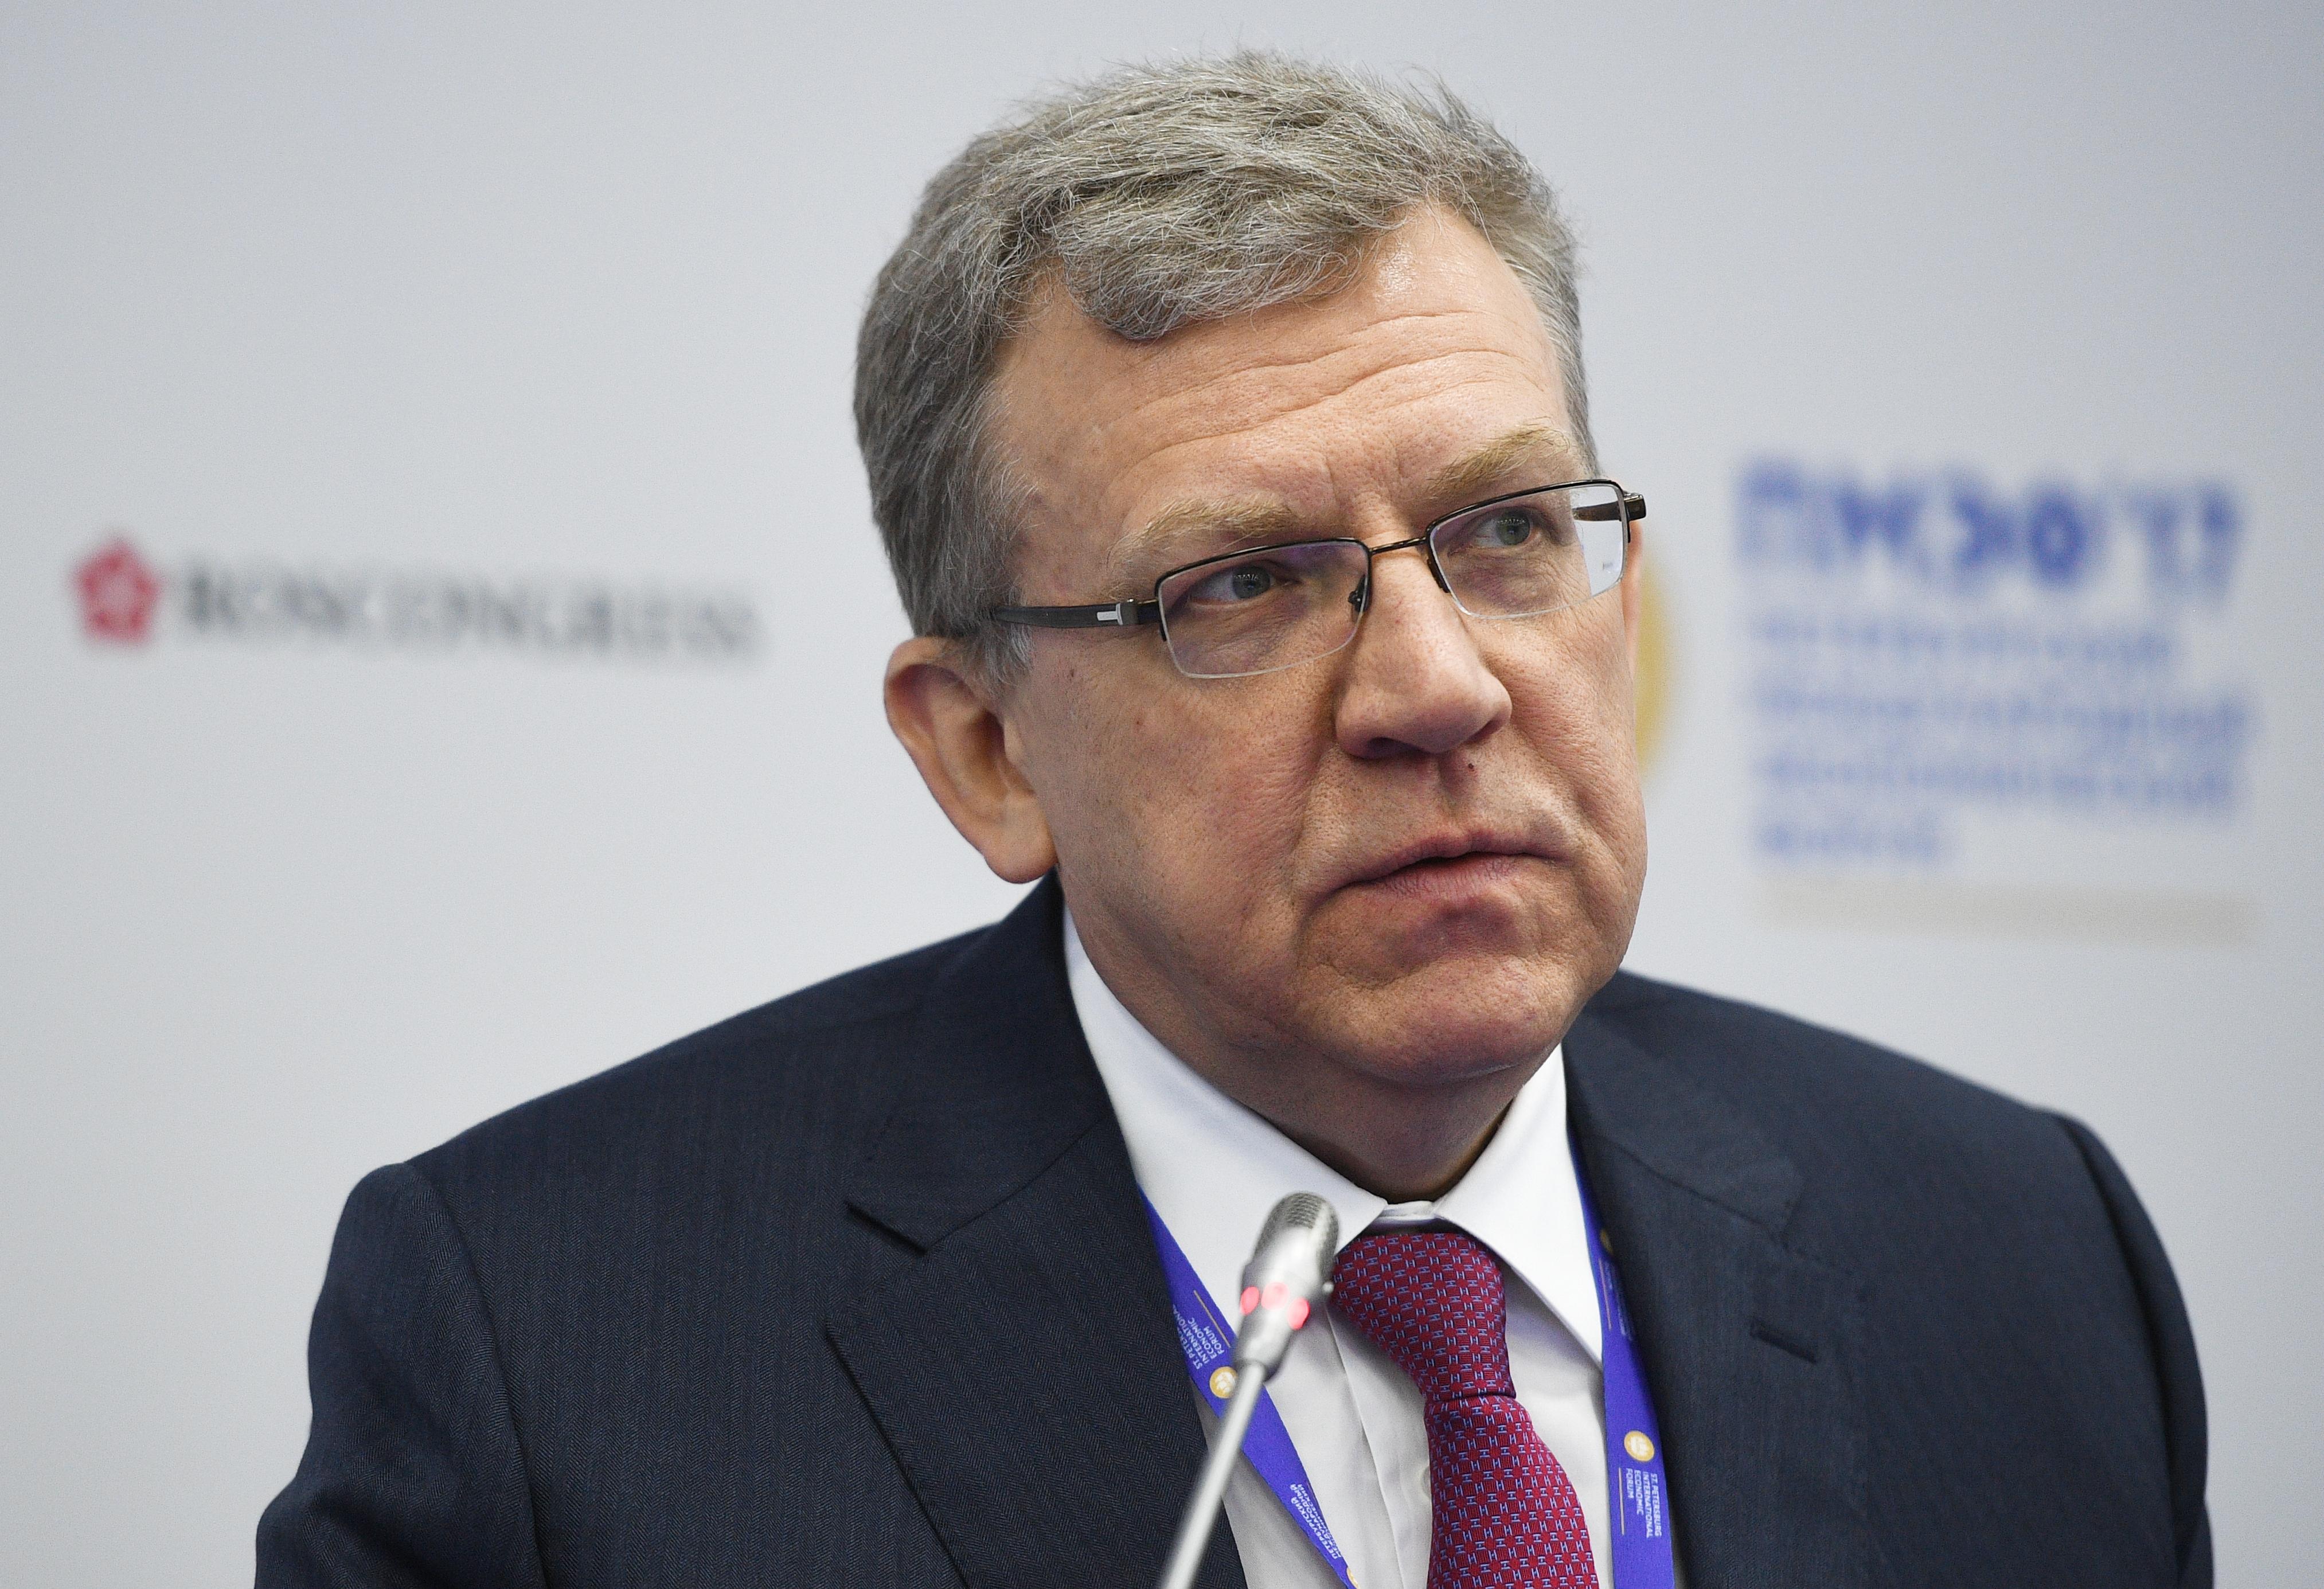 Кудрин против Силуанова. О чем спорят на Петербургском форуме